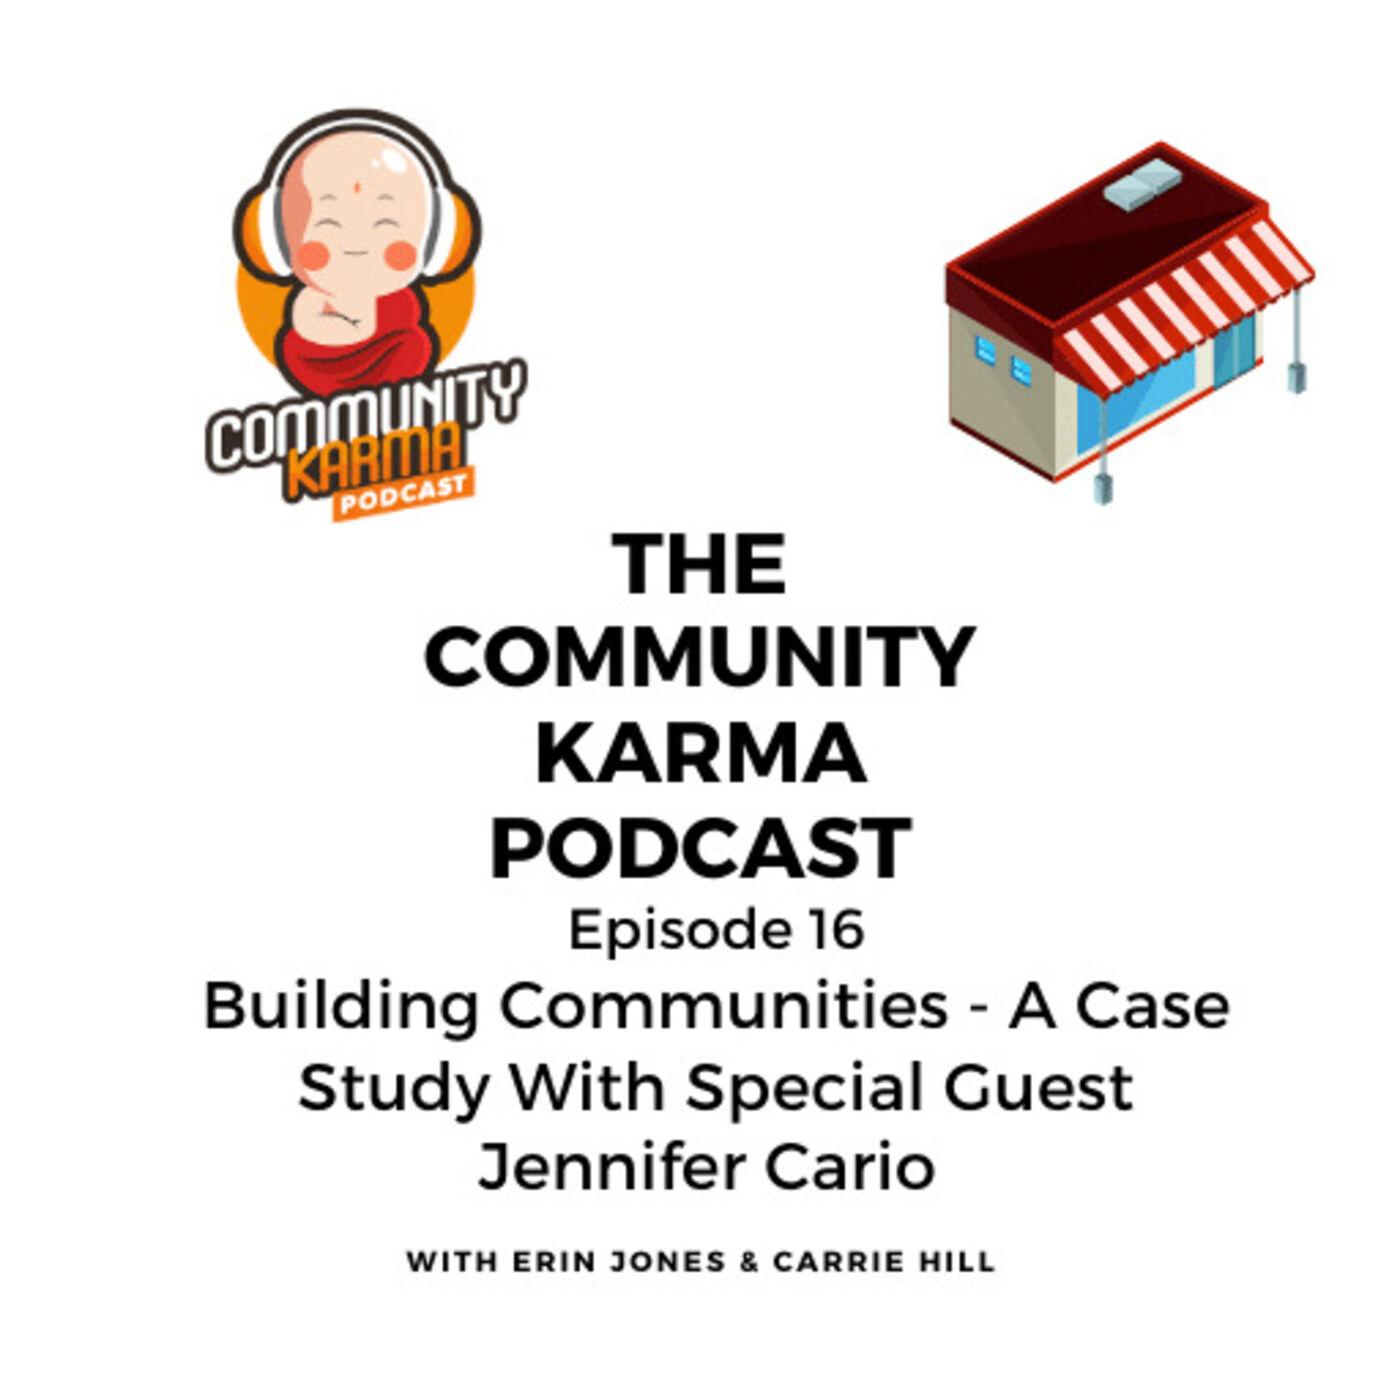 Episode 16: Building Communities - A Case Study with Jennifer Cario